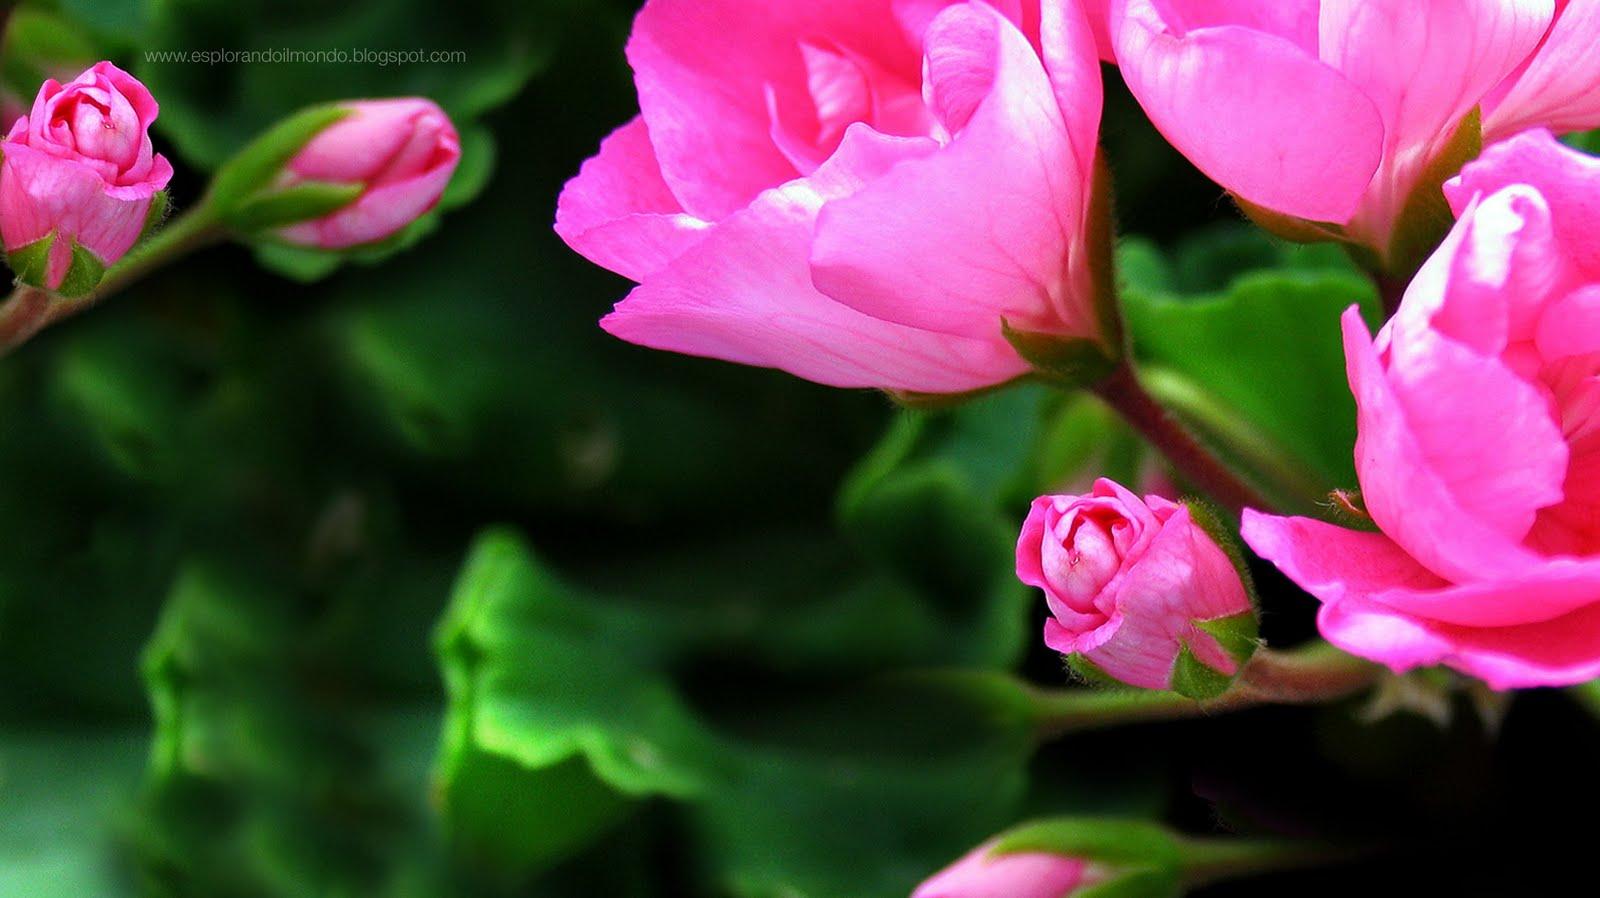 http://3.bp.blogspot.com/-vYpdI7WGYk0/TftcVCDAPsI/AAAAAAAACKY/IbofofGJDQg/s1600/fondale+gerani.jpg